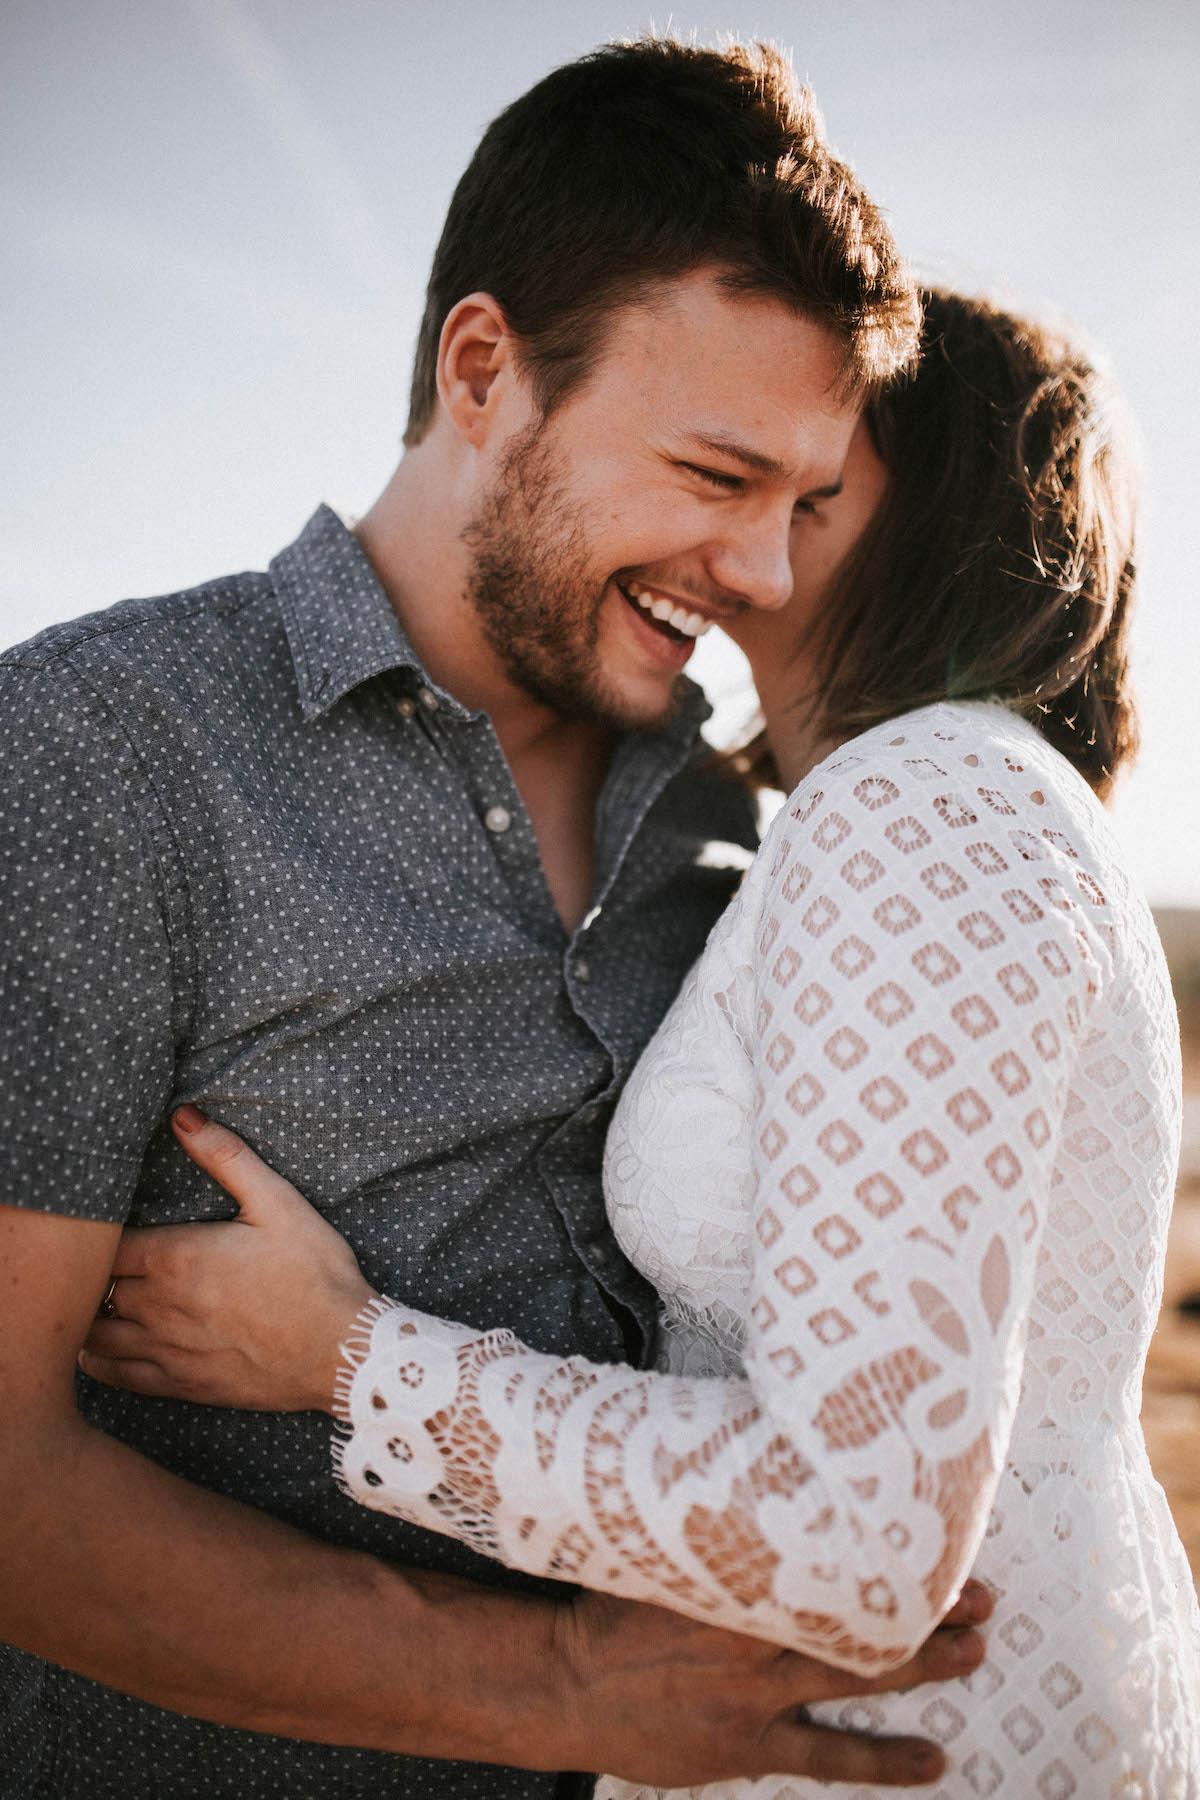 adventures couple photoshoot outdoors in Georgia